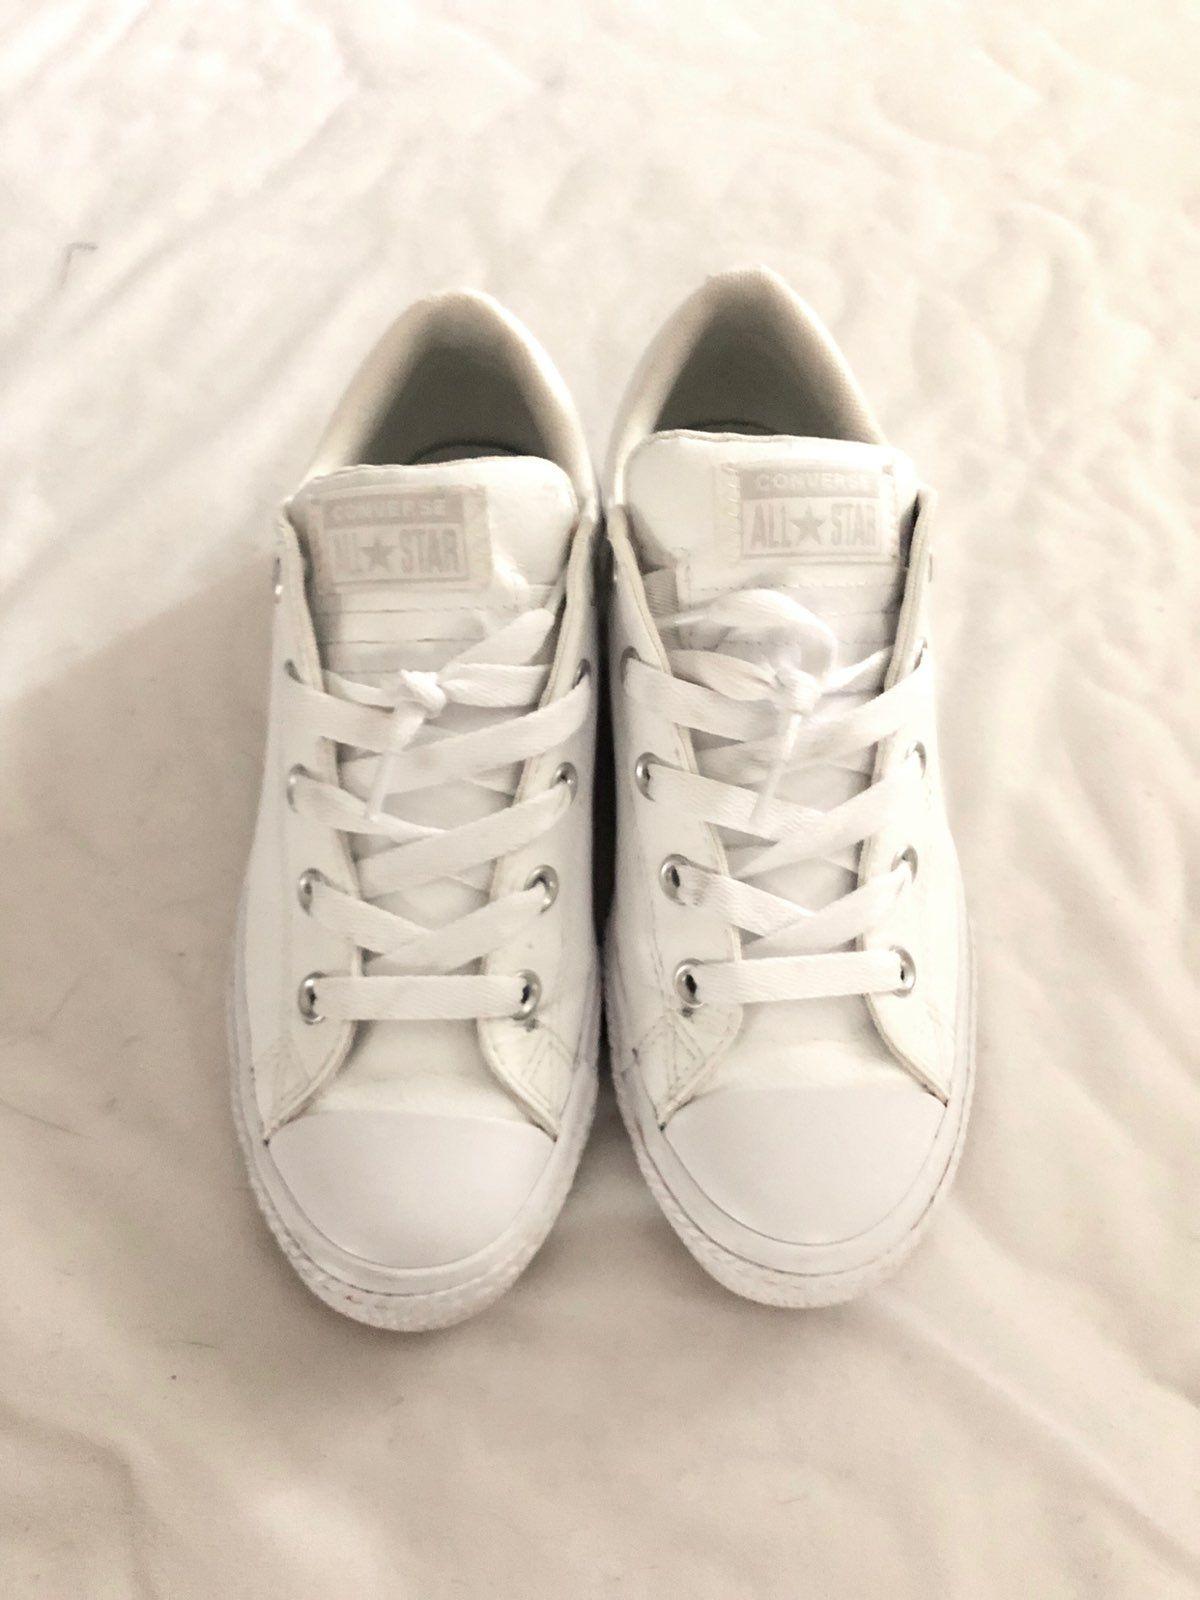 size 6 white converse all stars